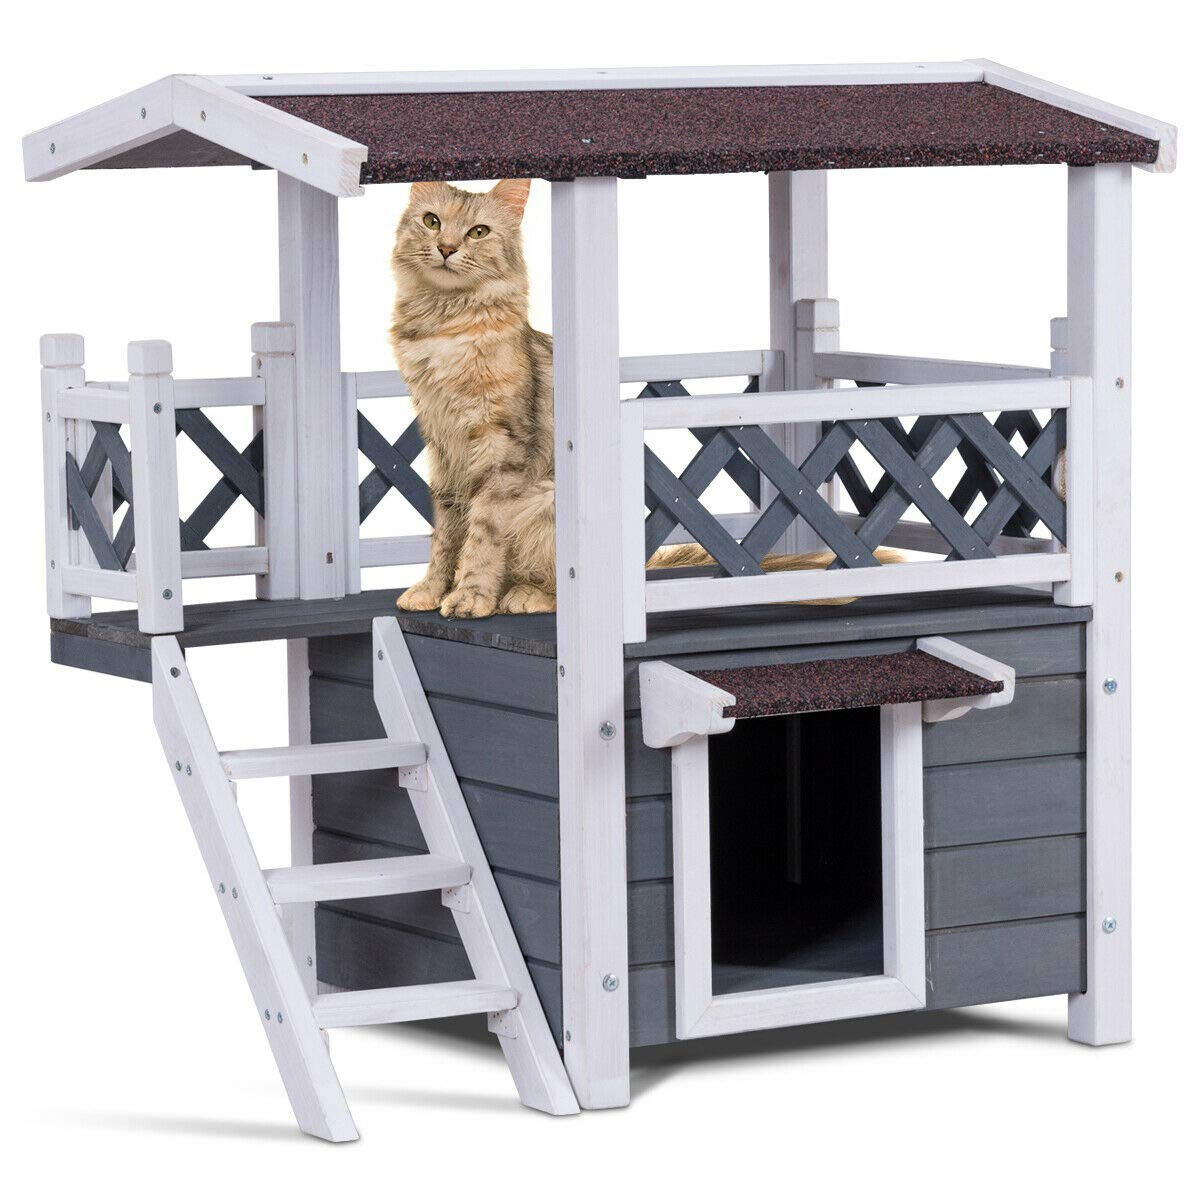 Tangkula Cat House 2 Story Wood Outdoor Weatherproof Pet Kitten Condo Shelter by Tangkula